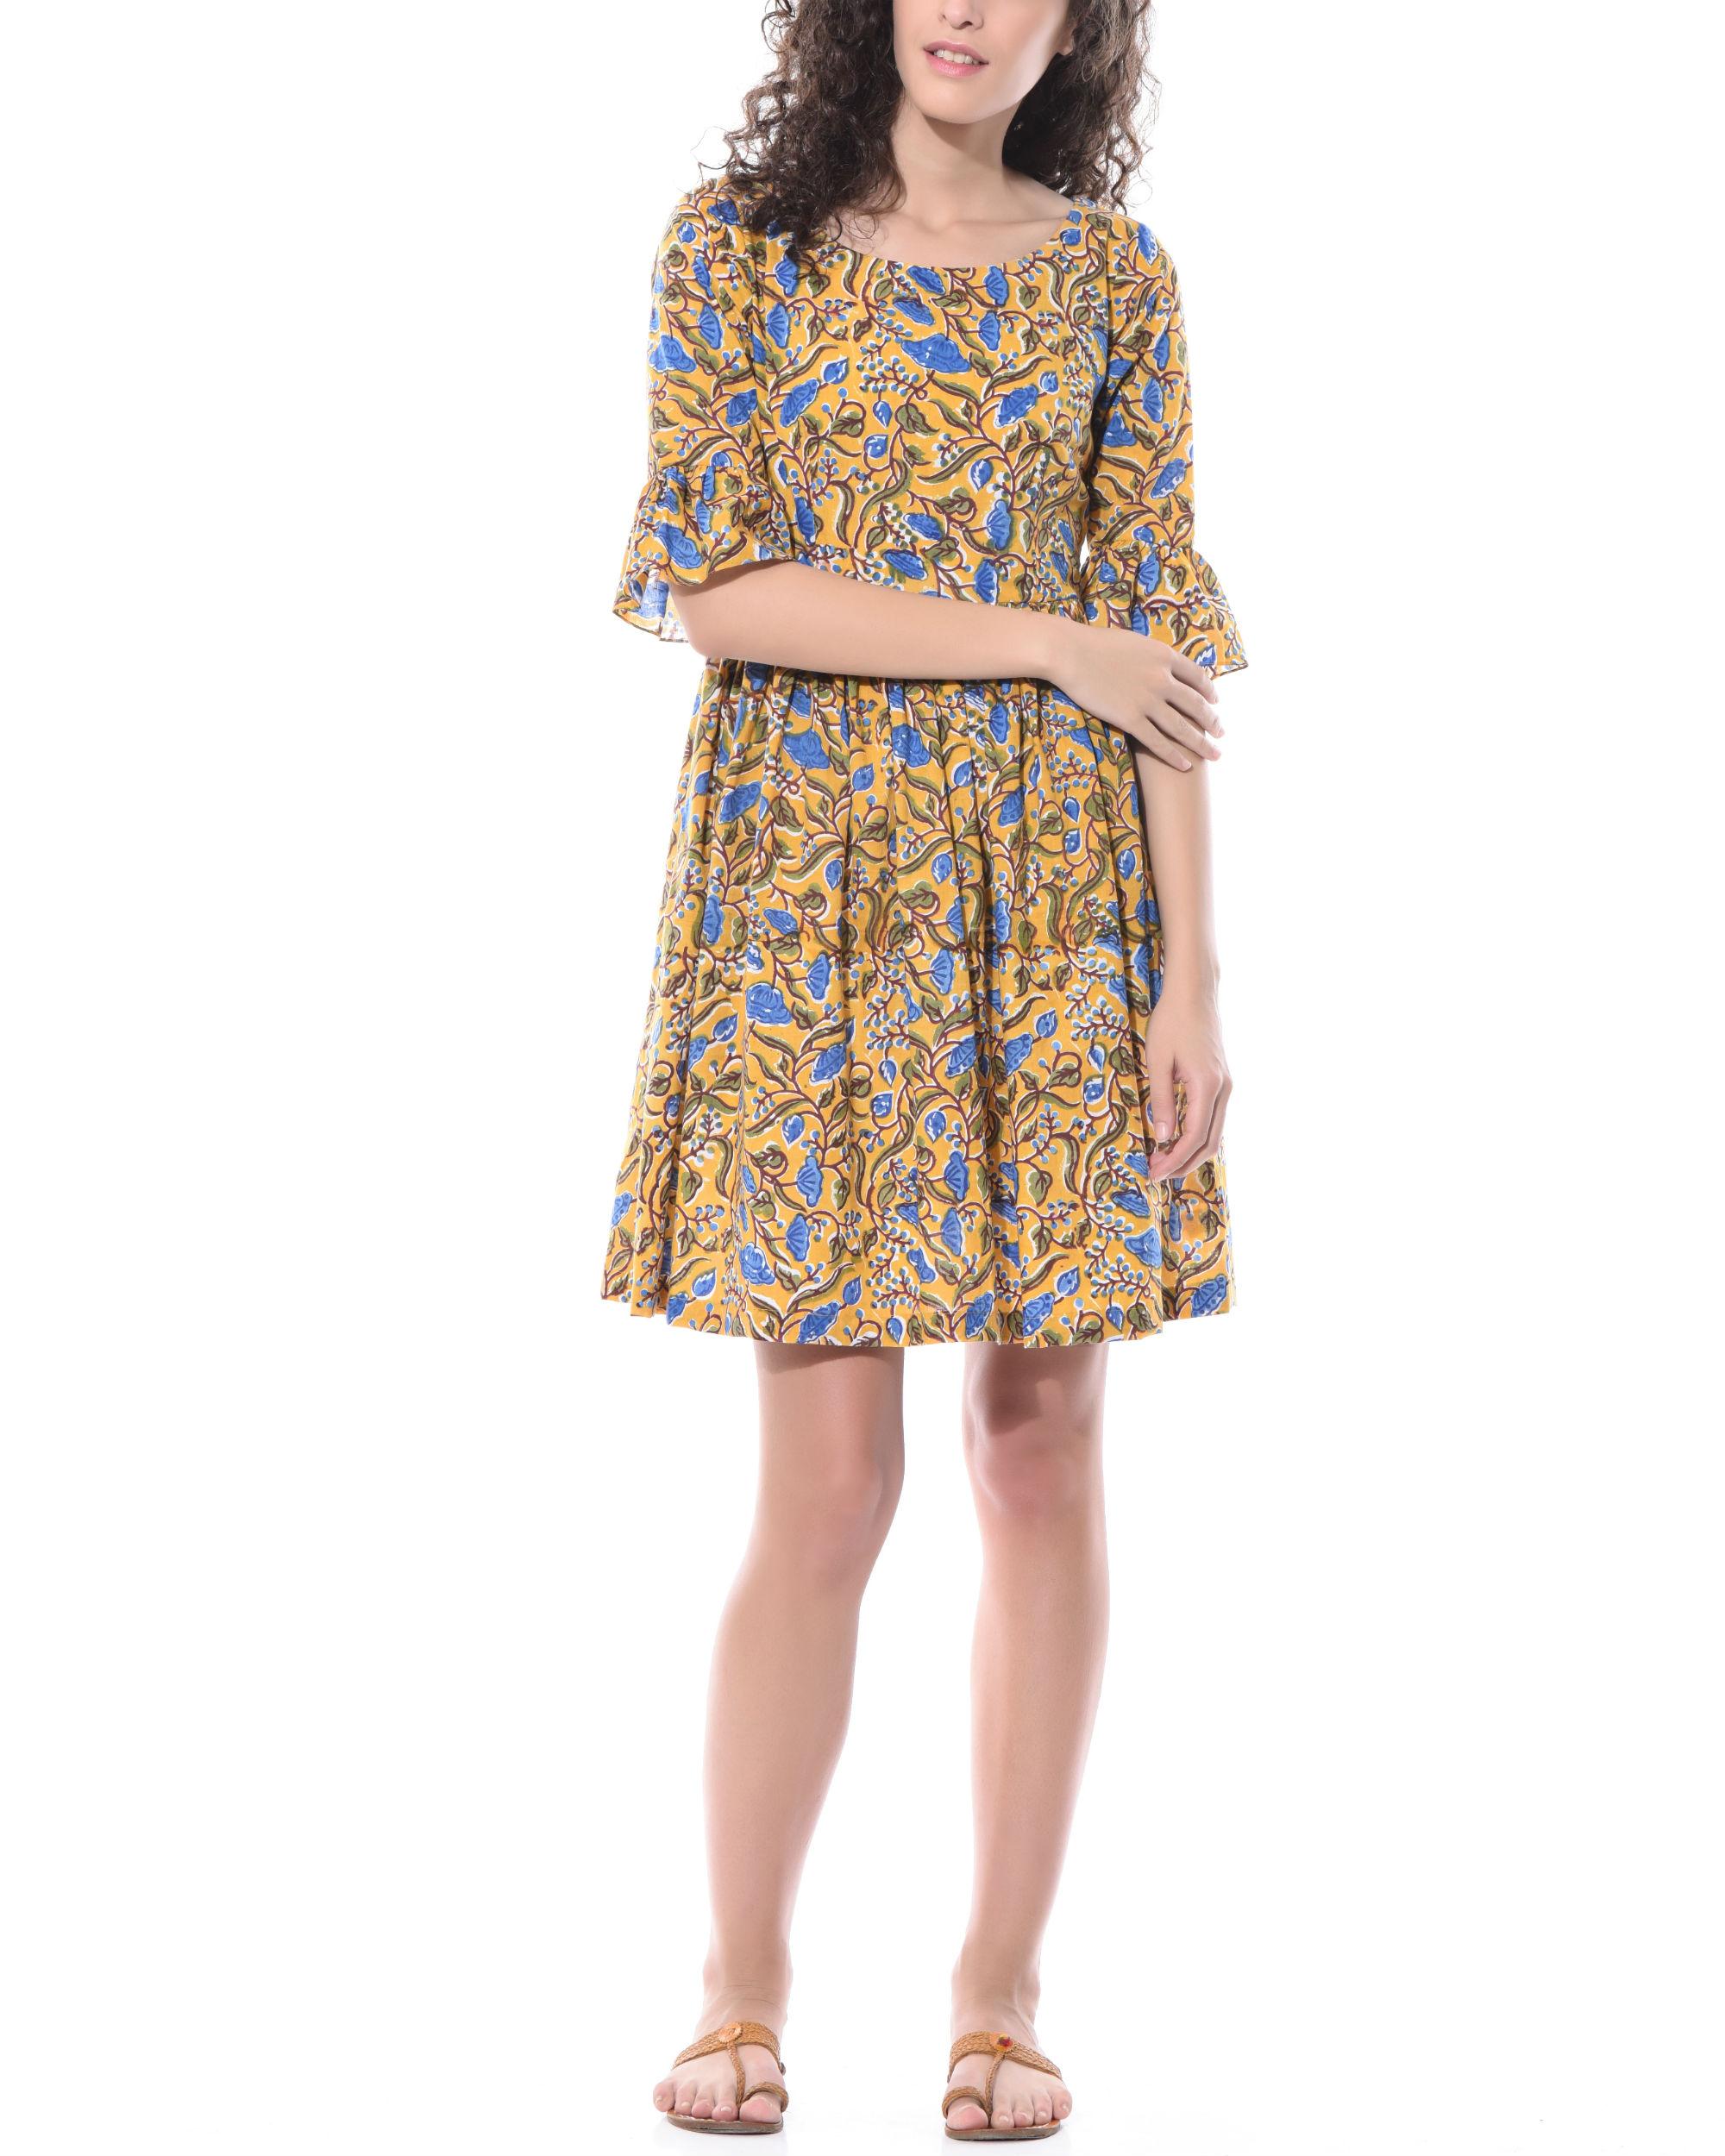 Hand printed floral dress